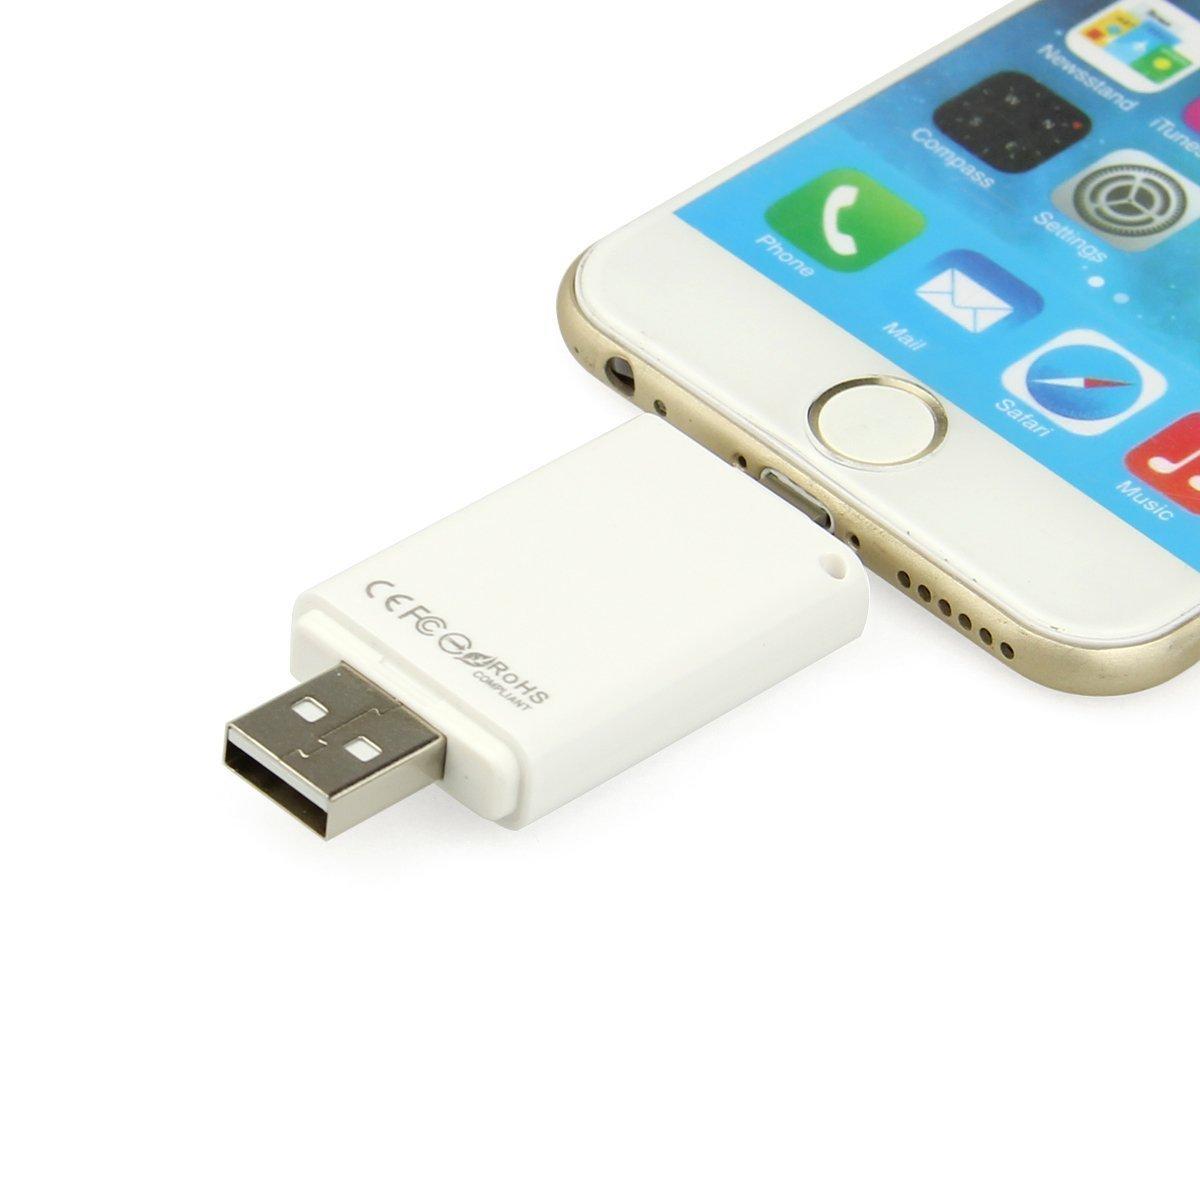 finest selection 9150c 065f7 New I-flash Drive Flash Drive HD OTG for iPhone 6 plus,6,5s,5c/iPad ...